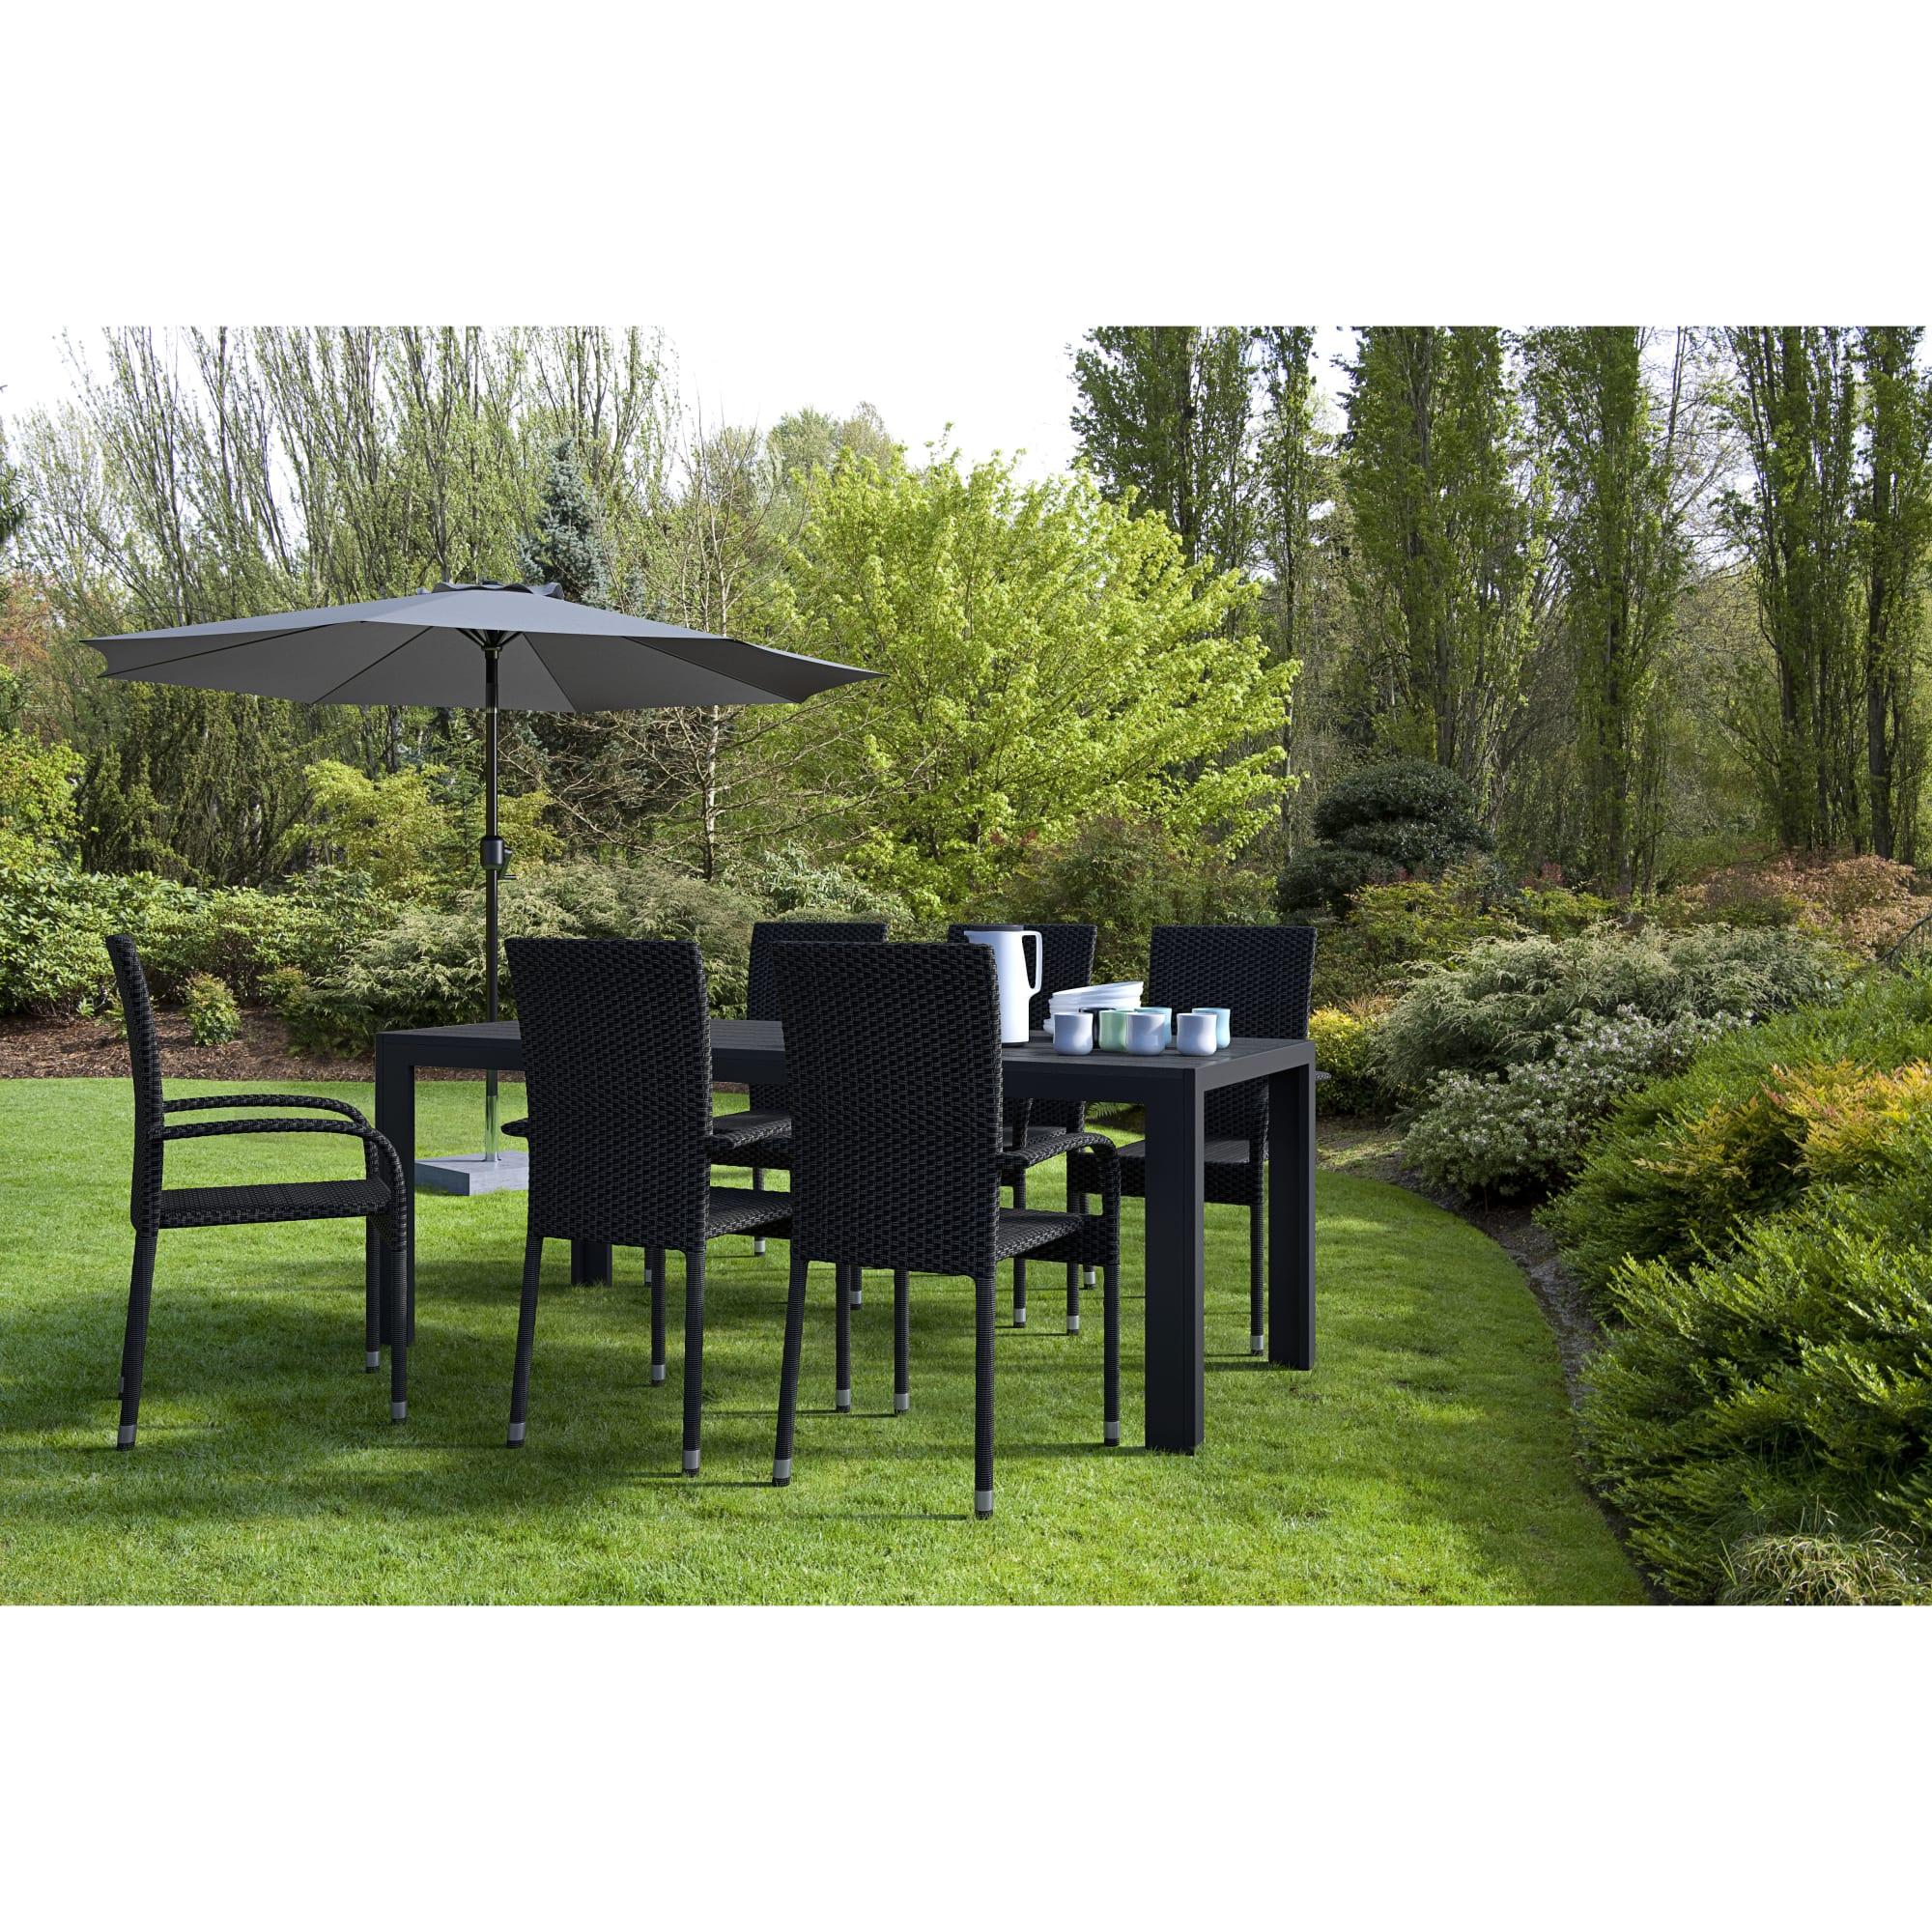 Bord (L 205 cm) og stabelbare stole